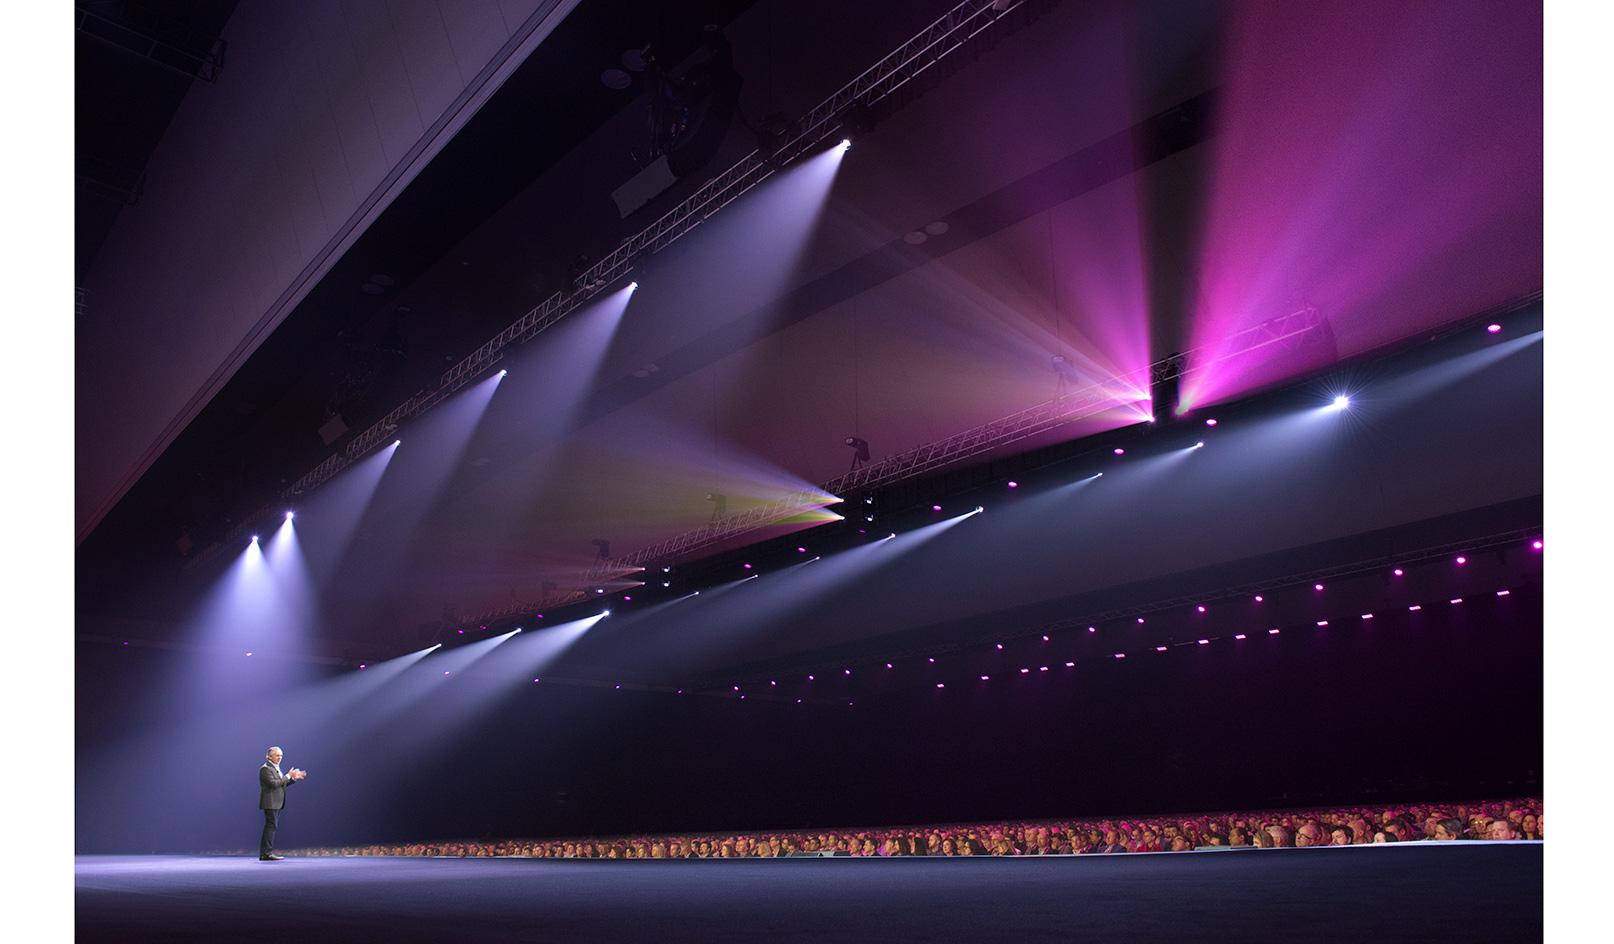 <div>Events</div><div> <a href='https://www.nedmeldrum.com.au/project/telstra-vantage/'>View Series</a></div>